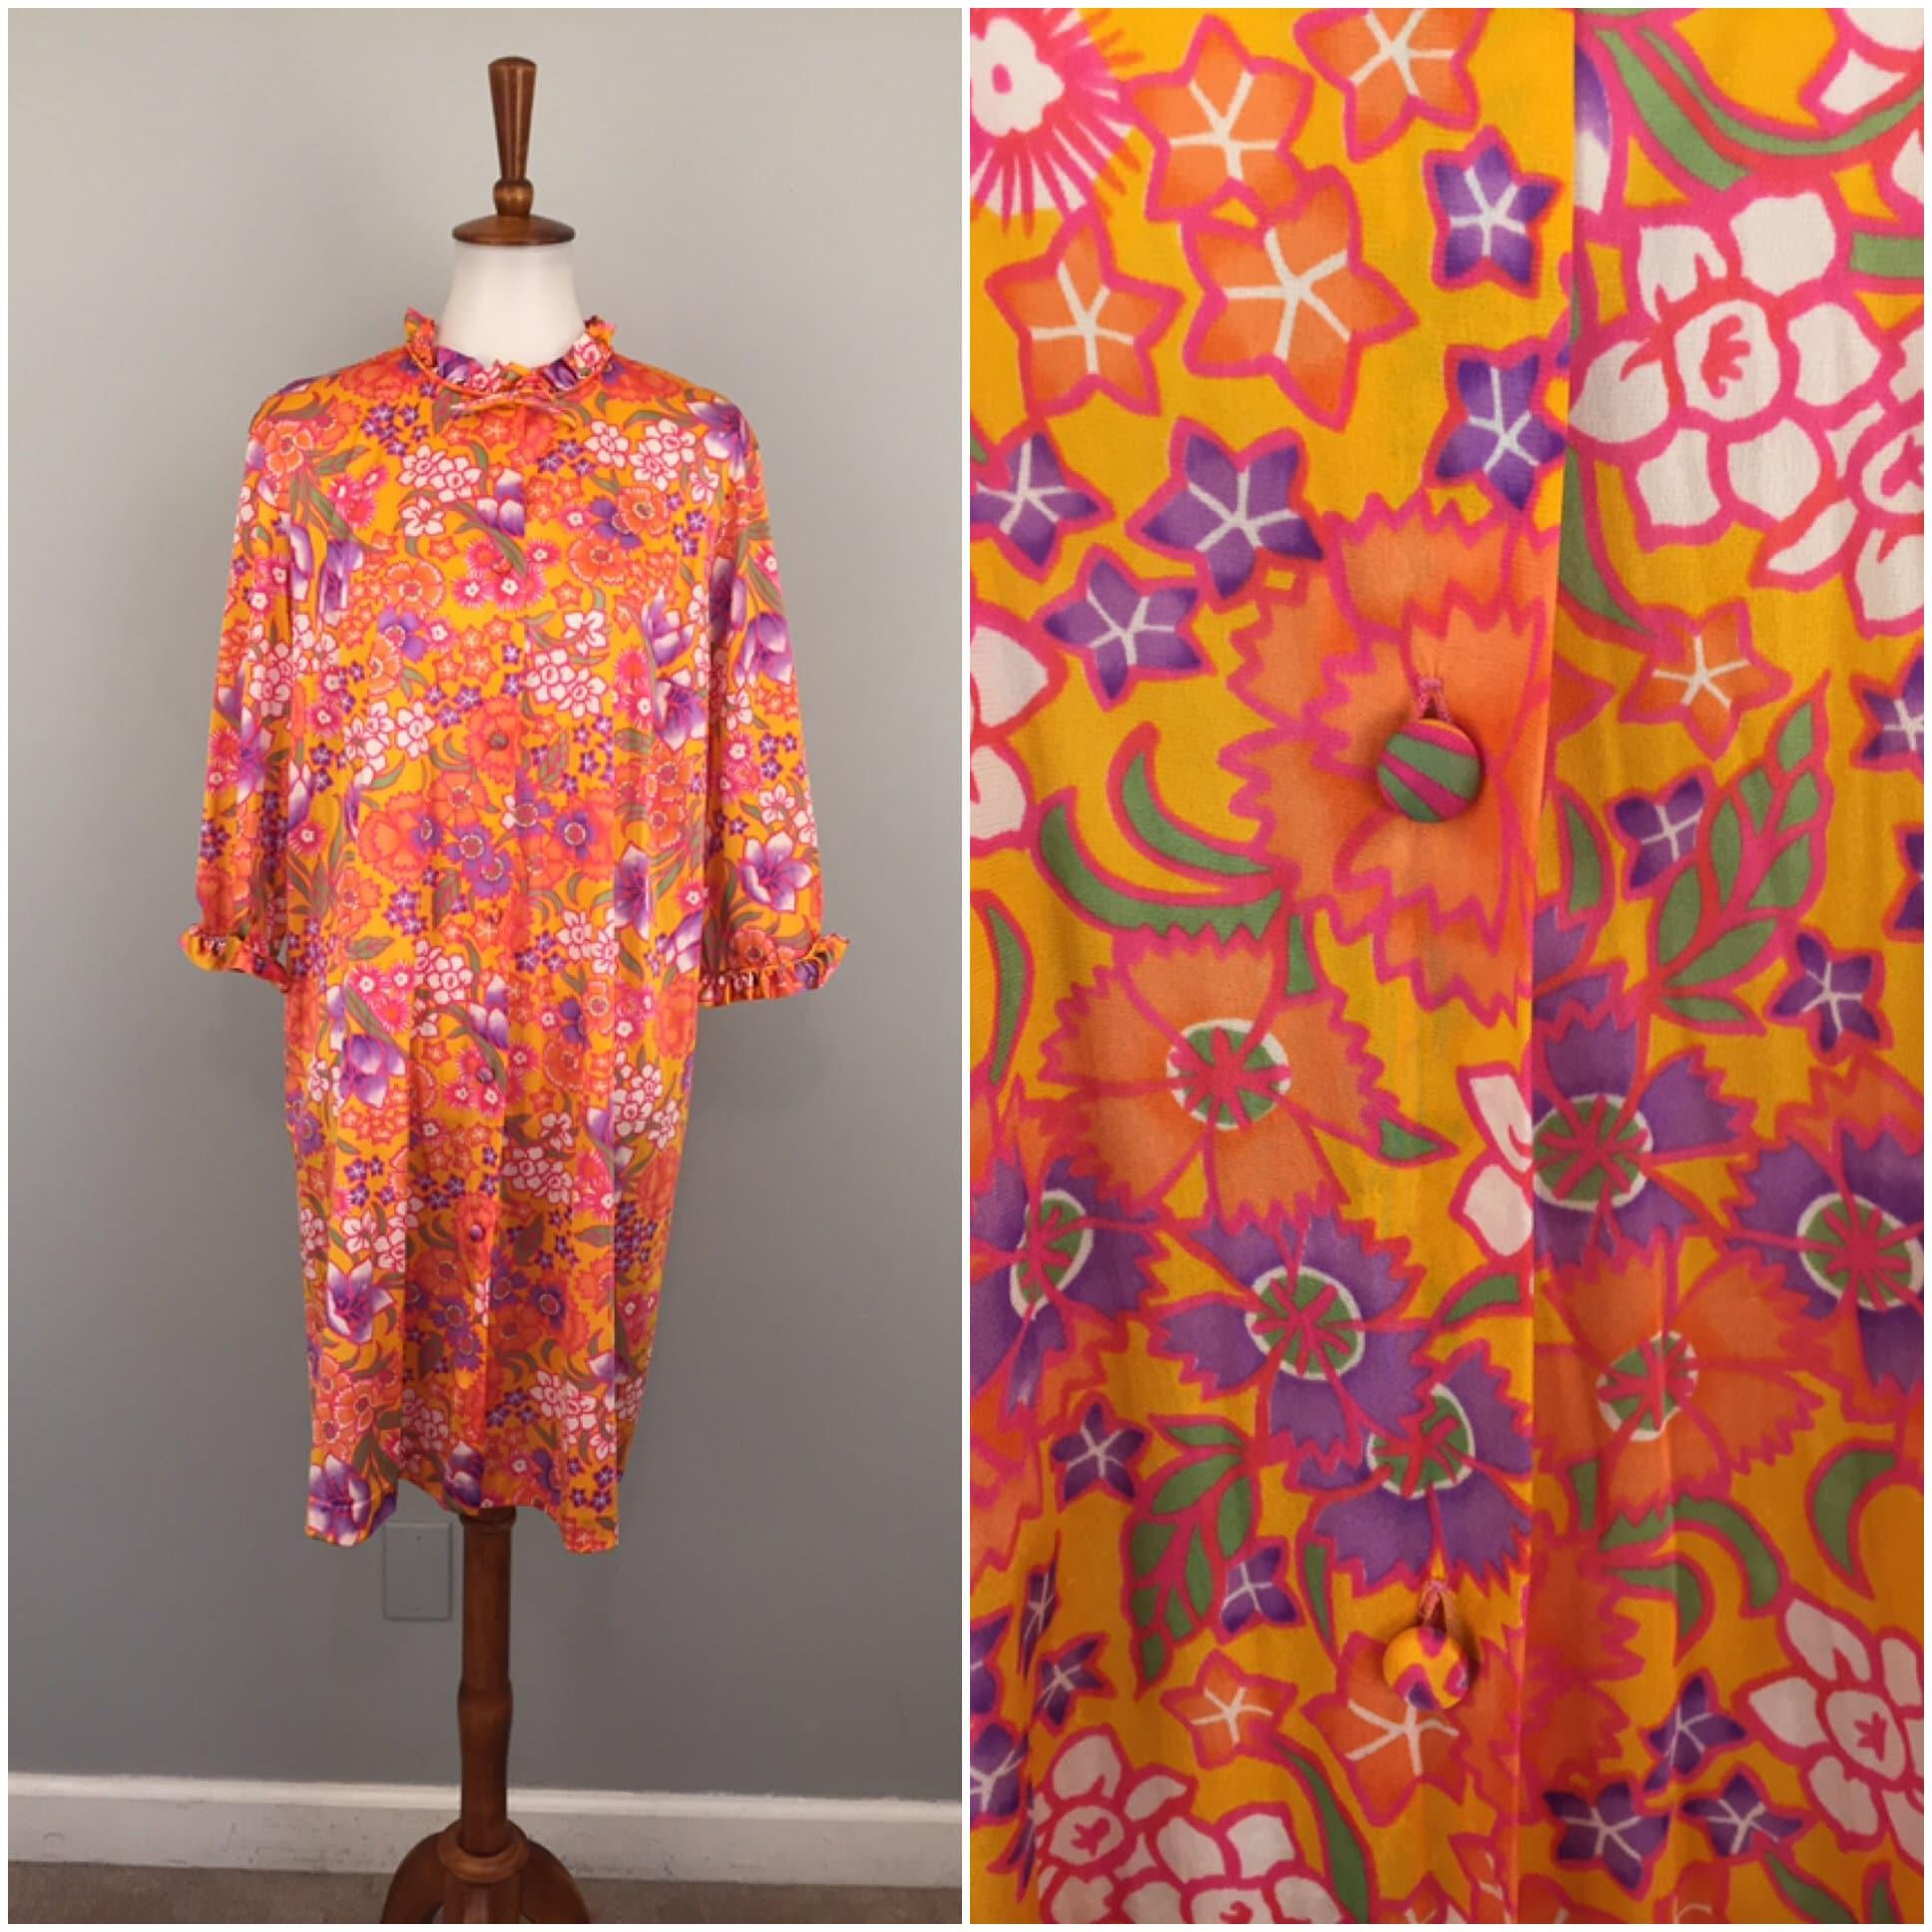 80s Dresses | Casual to Party Dresses Vintage Kaftan Flower Power Hippie Boho Bohemian Colorful Robe Orange Button Front Caftan Women Loungewear 1970S 1980S 70S 80S $0.00 AT vintagedancer.com